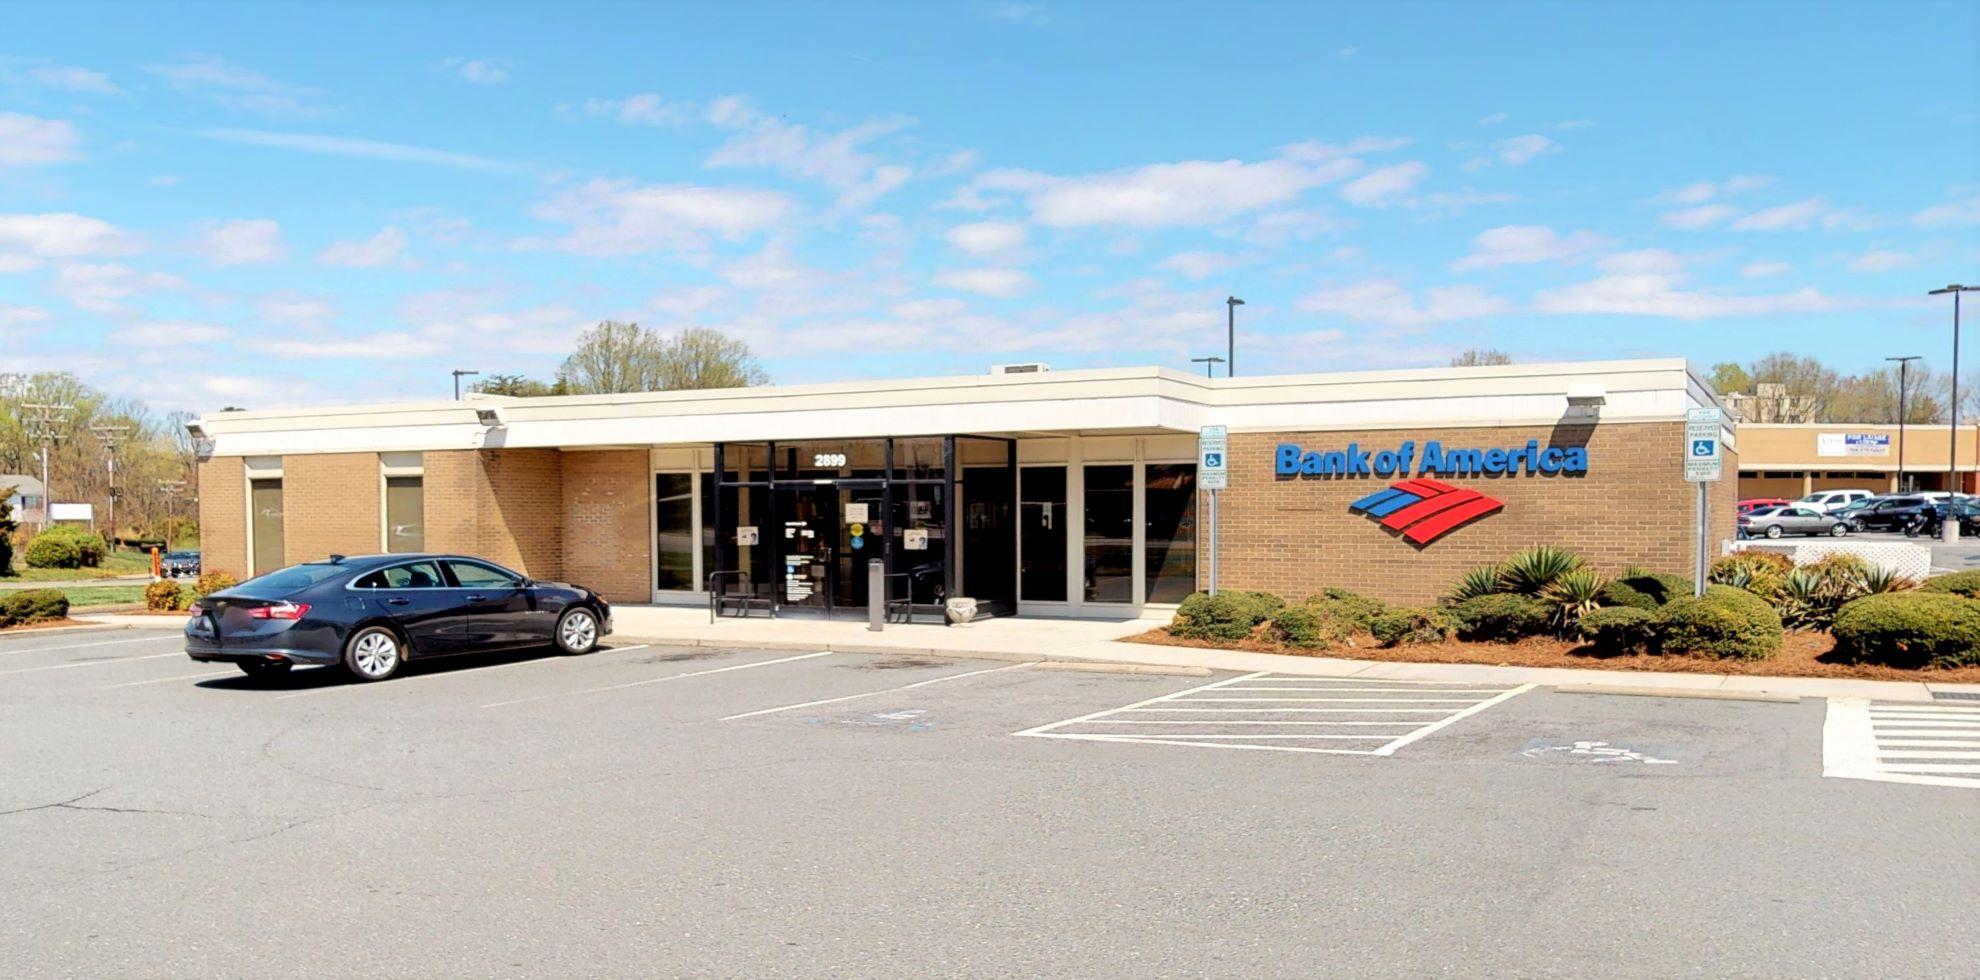 Bank of America financial center with drive-thru ATM | 2899 Reynolda Rd, Winston Salem, NC 27106